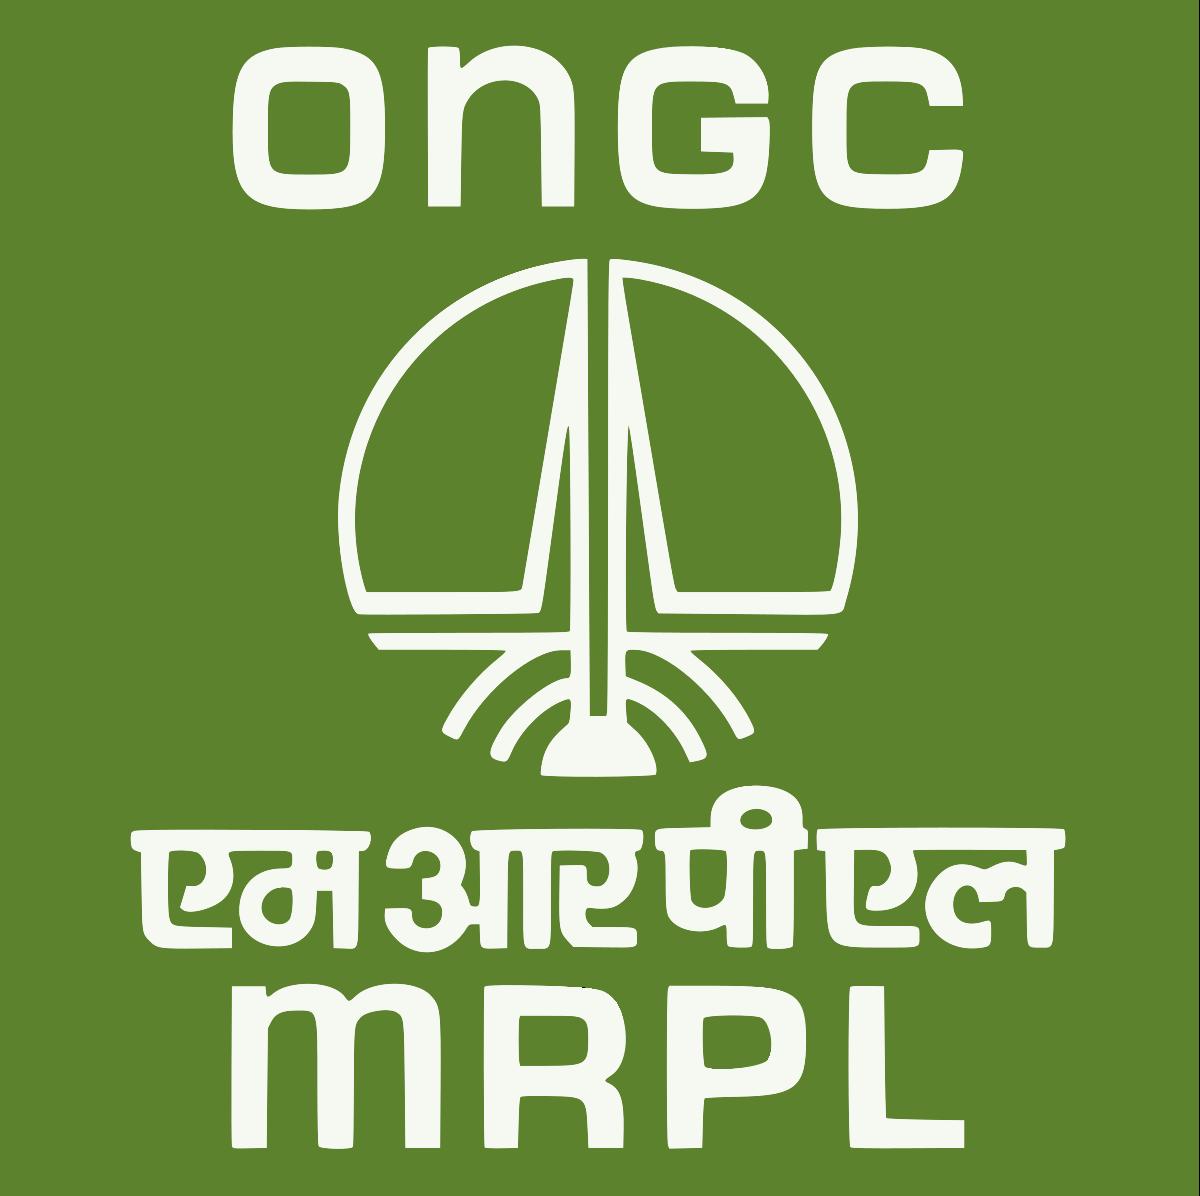 https://finpedia.co/bin/download/Mangalore%20Refinery%20%26%20Petrochemicals%20Ltd/WebHome/MRPL0.png?rev=1.1